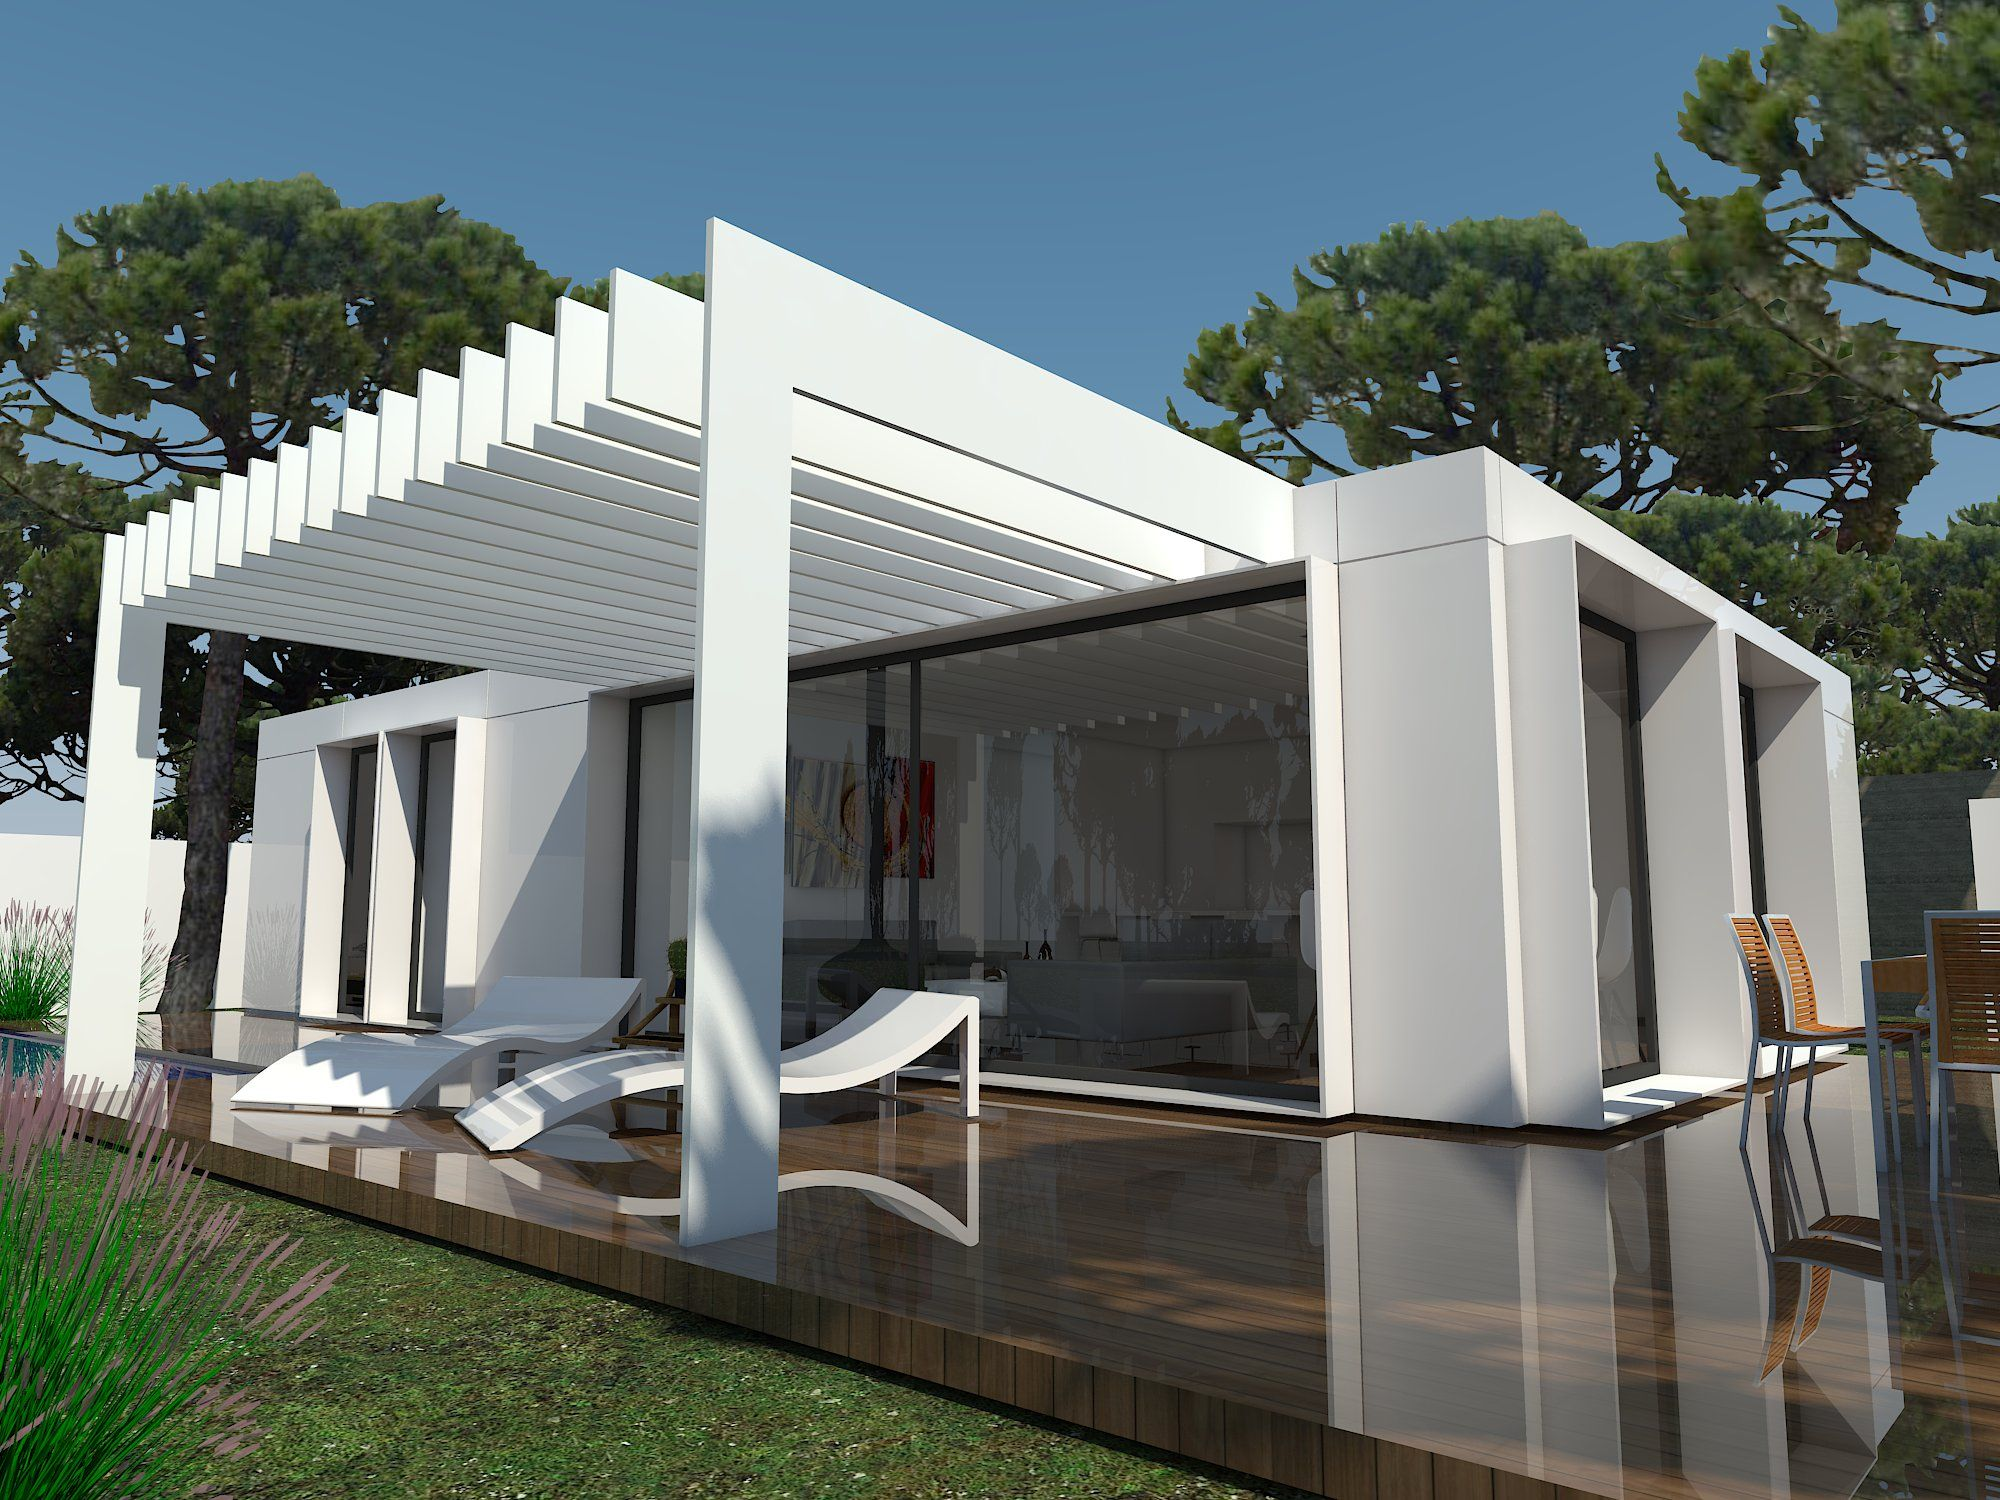 Pin by oziander on container casas hechas con - Casas de contenedores maritimos ...